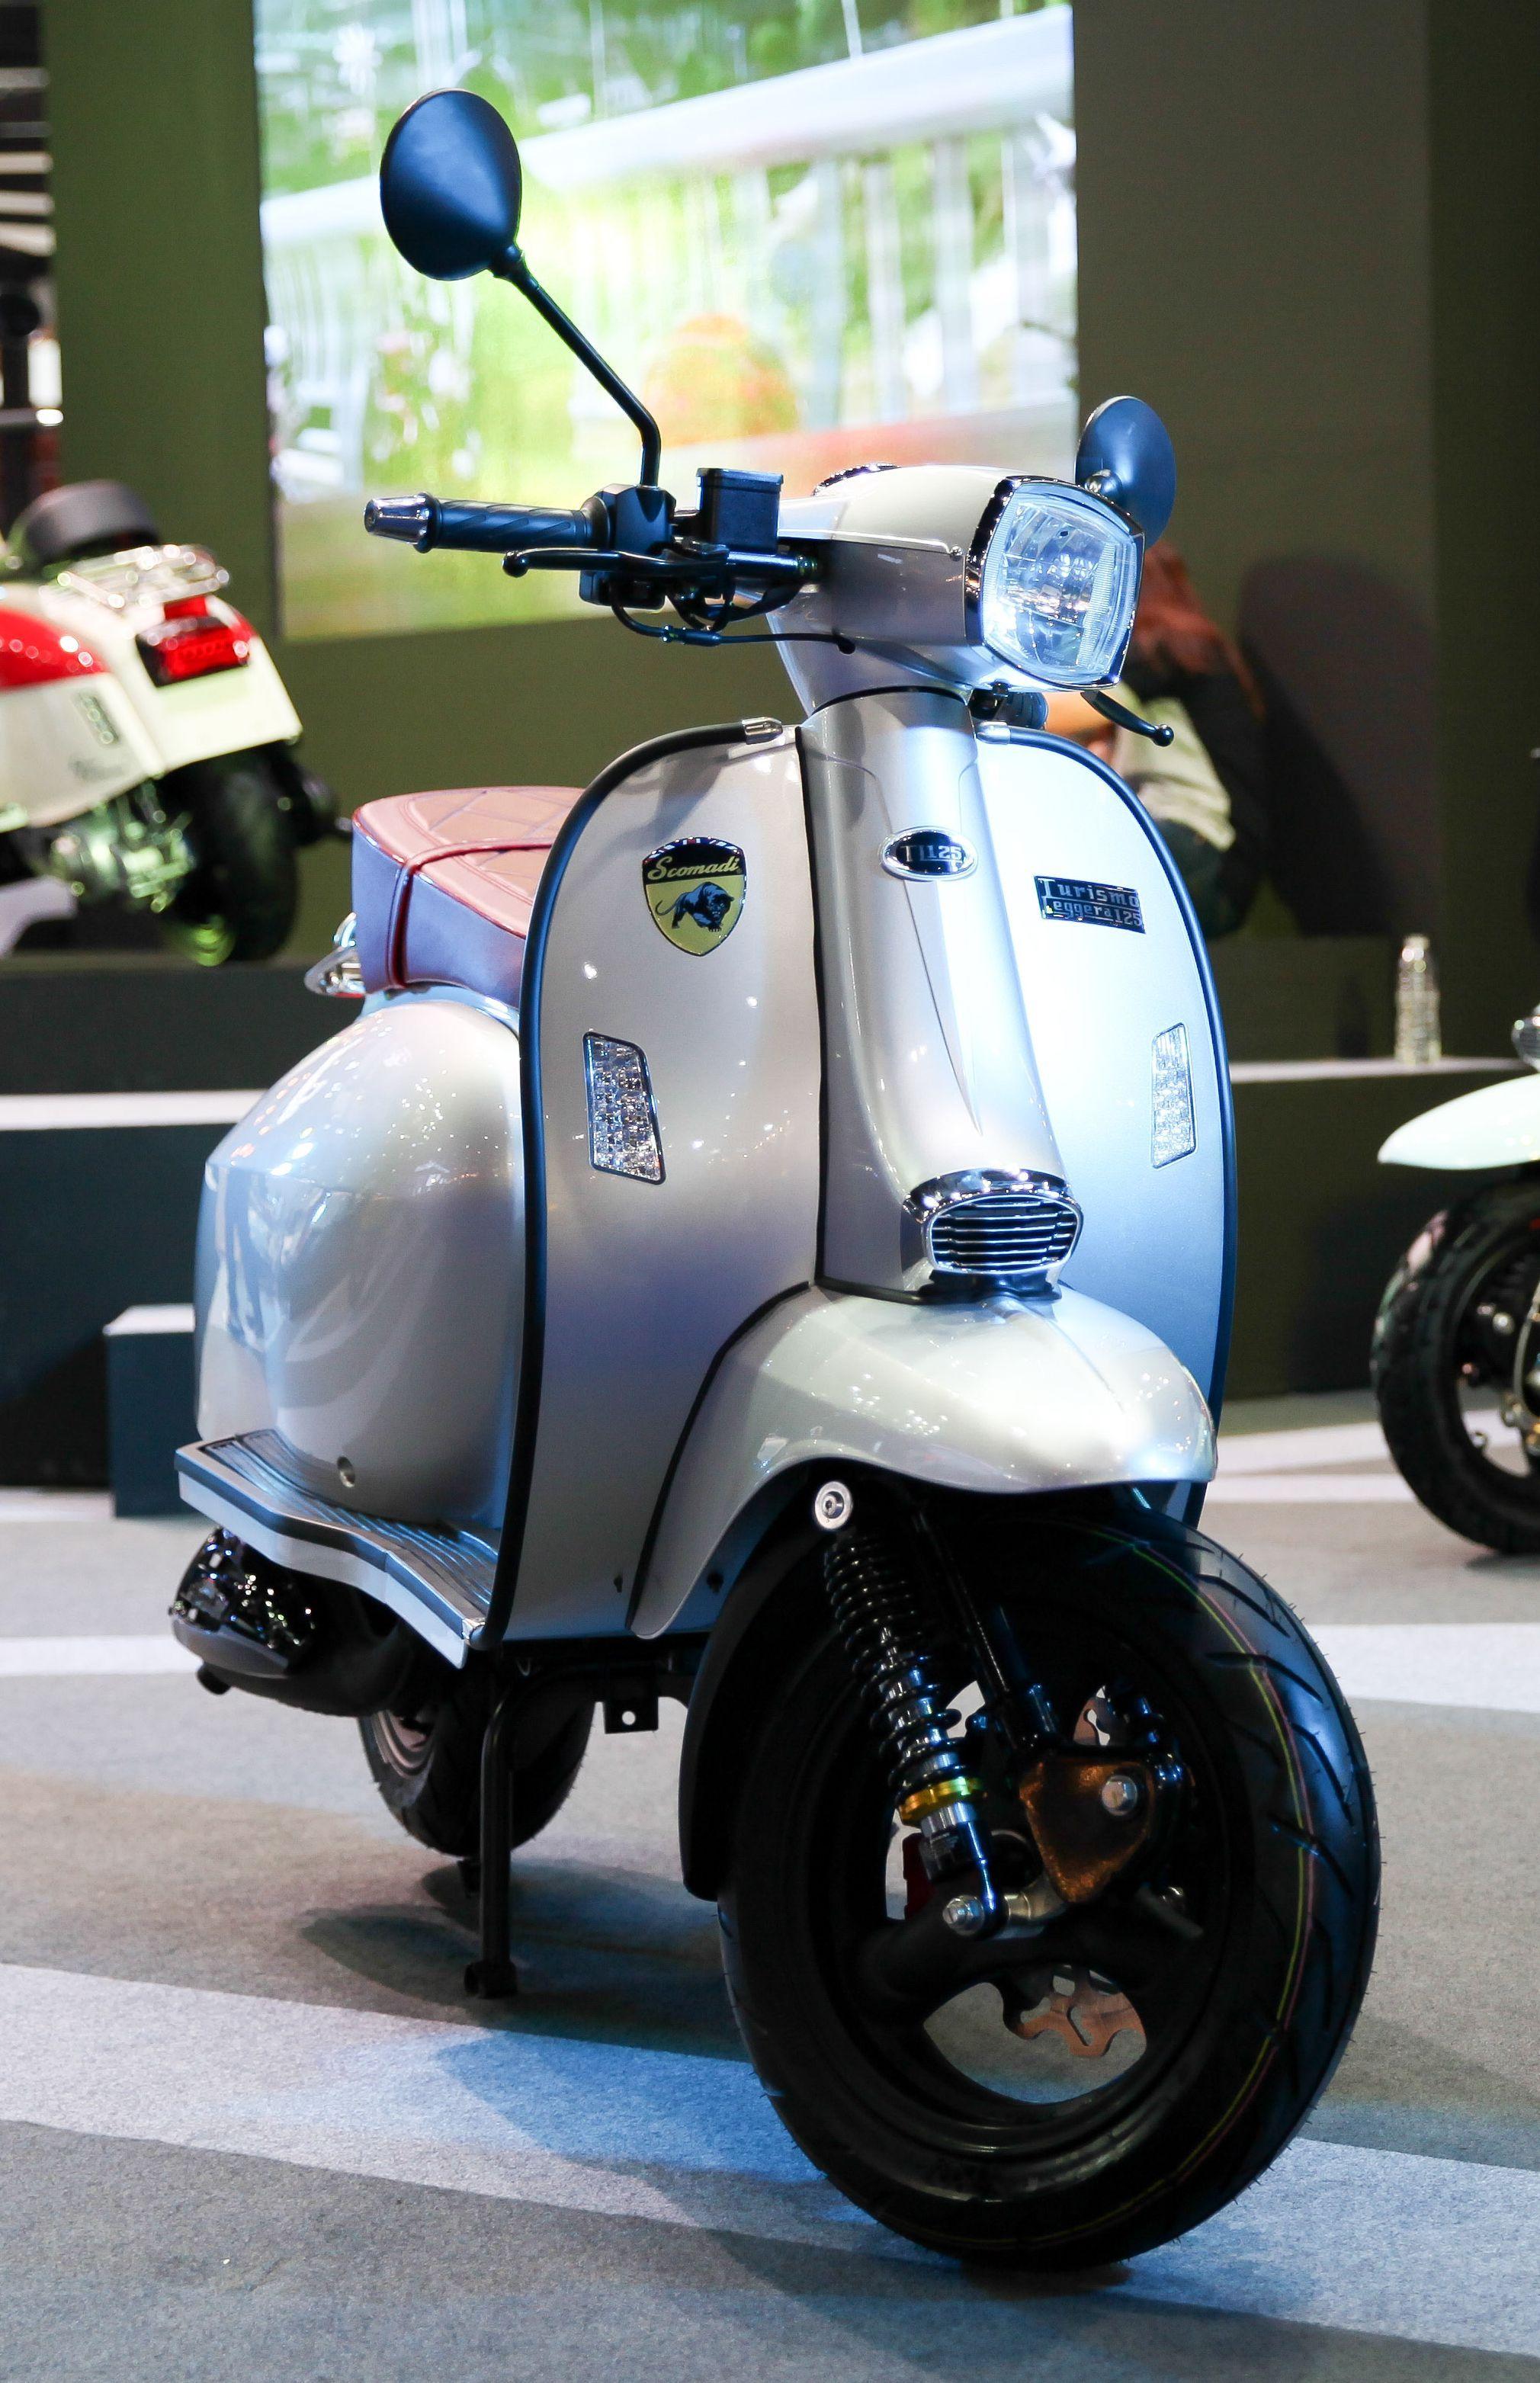 THE CLASSIC SPIRIT LIVES ON | scomadi | Lambretta scooter